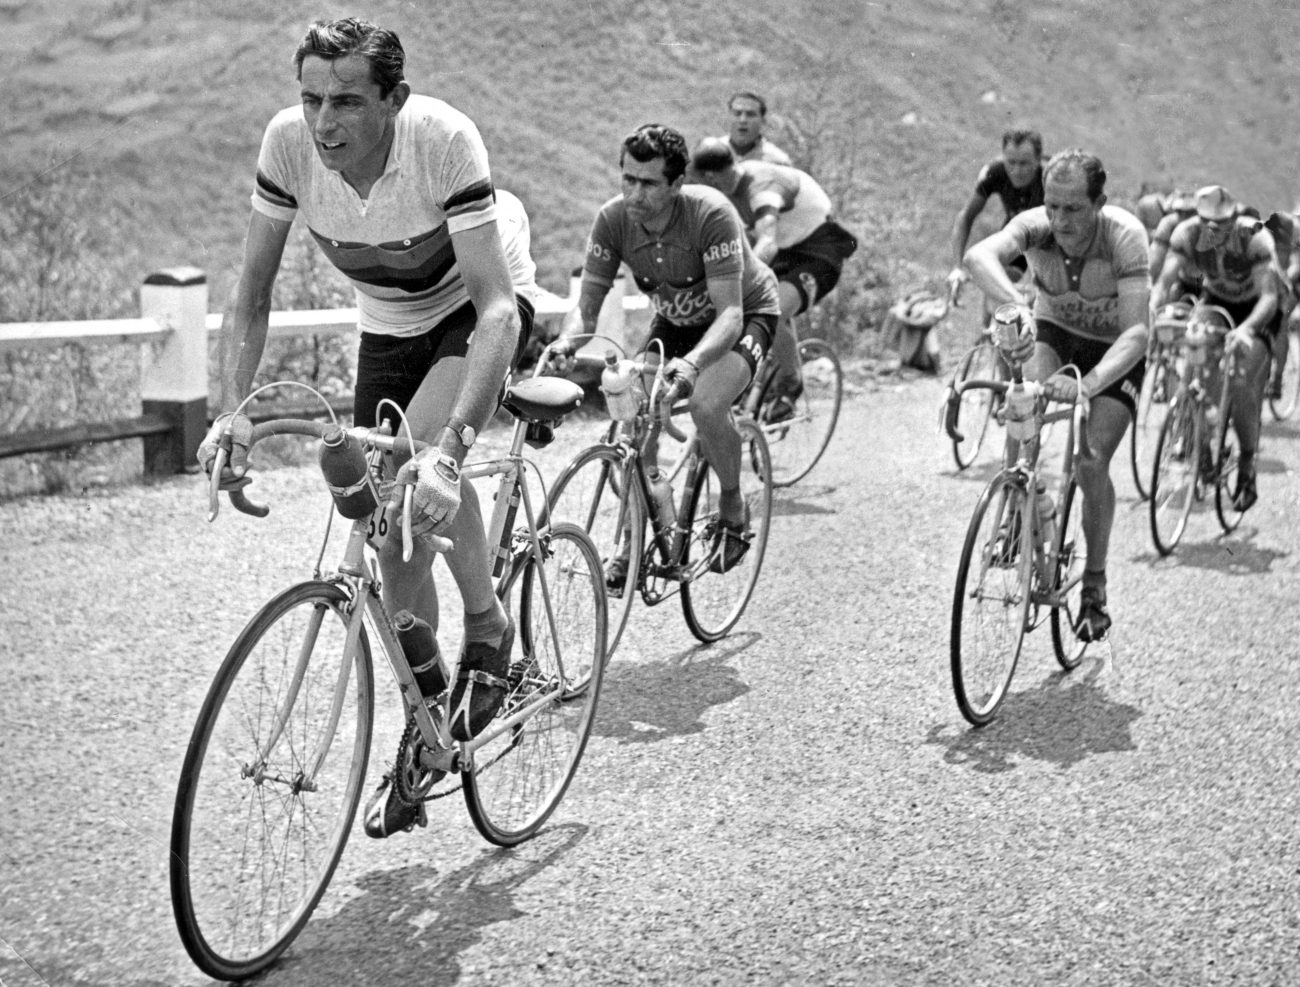 Fausto Coppi, Gino Bartali